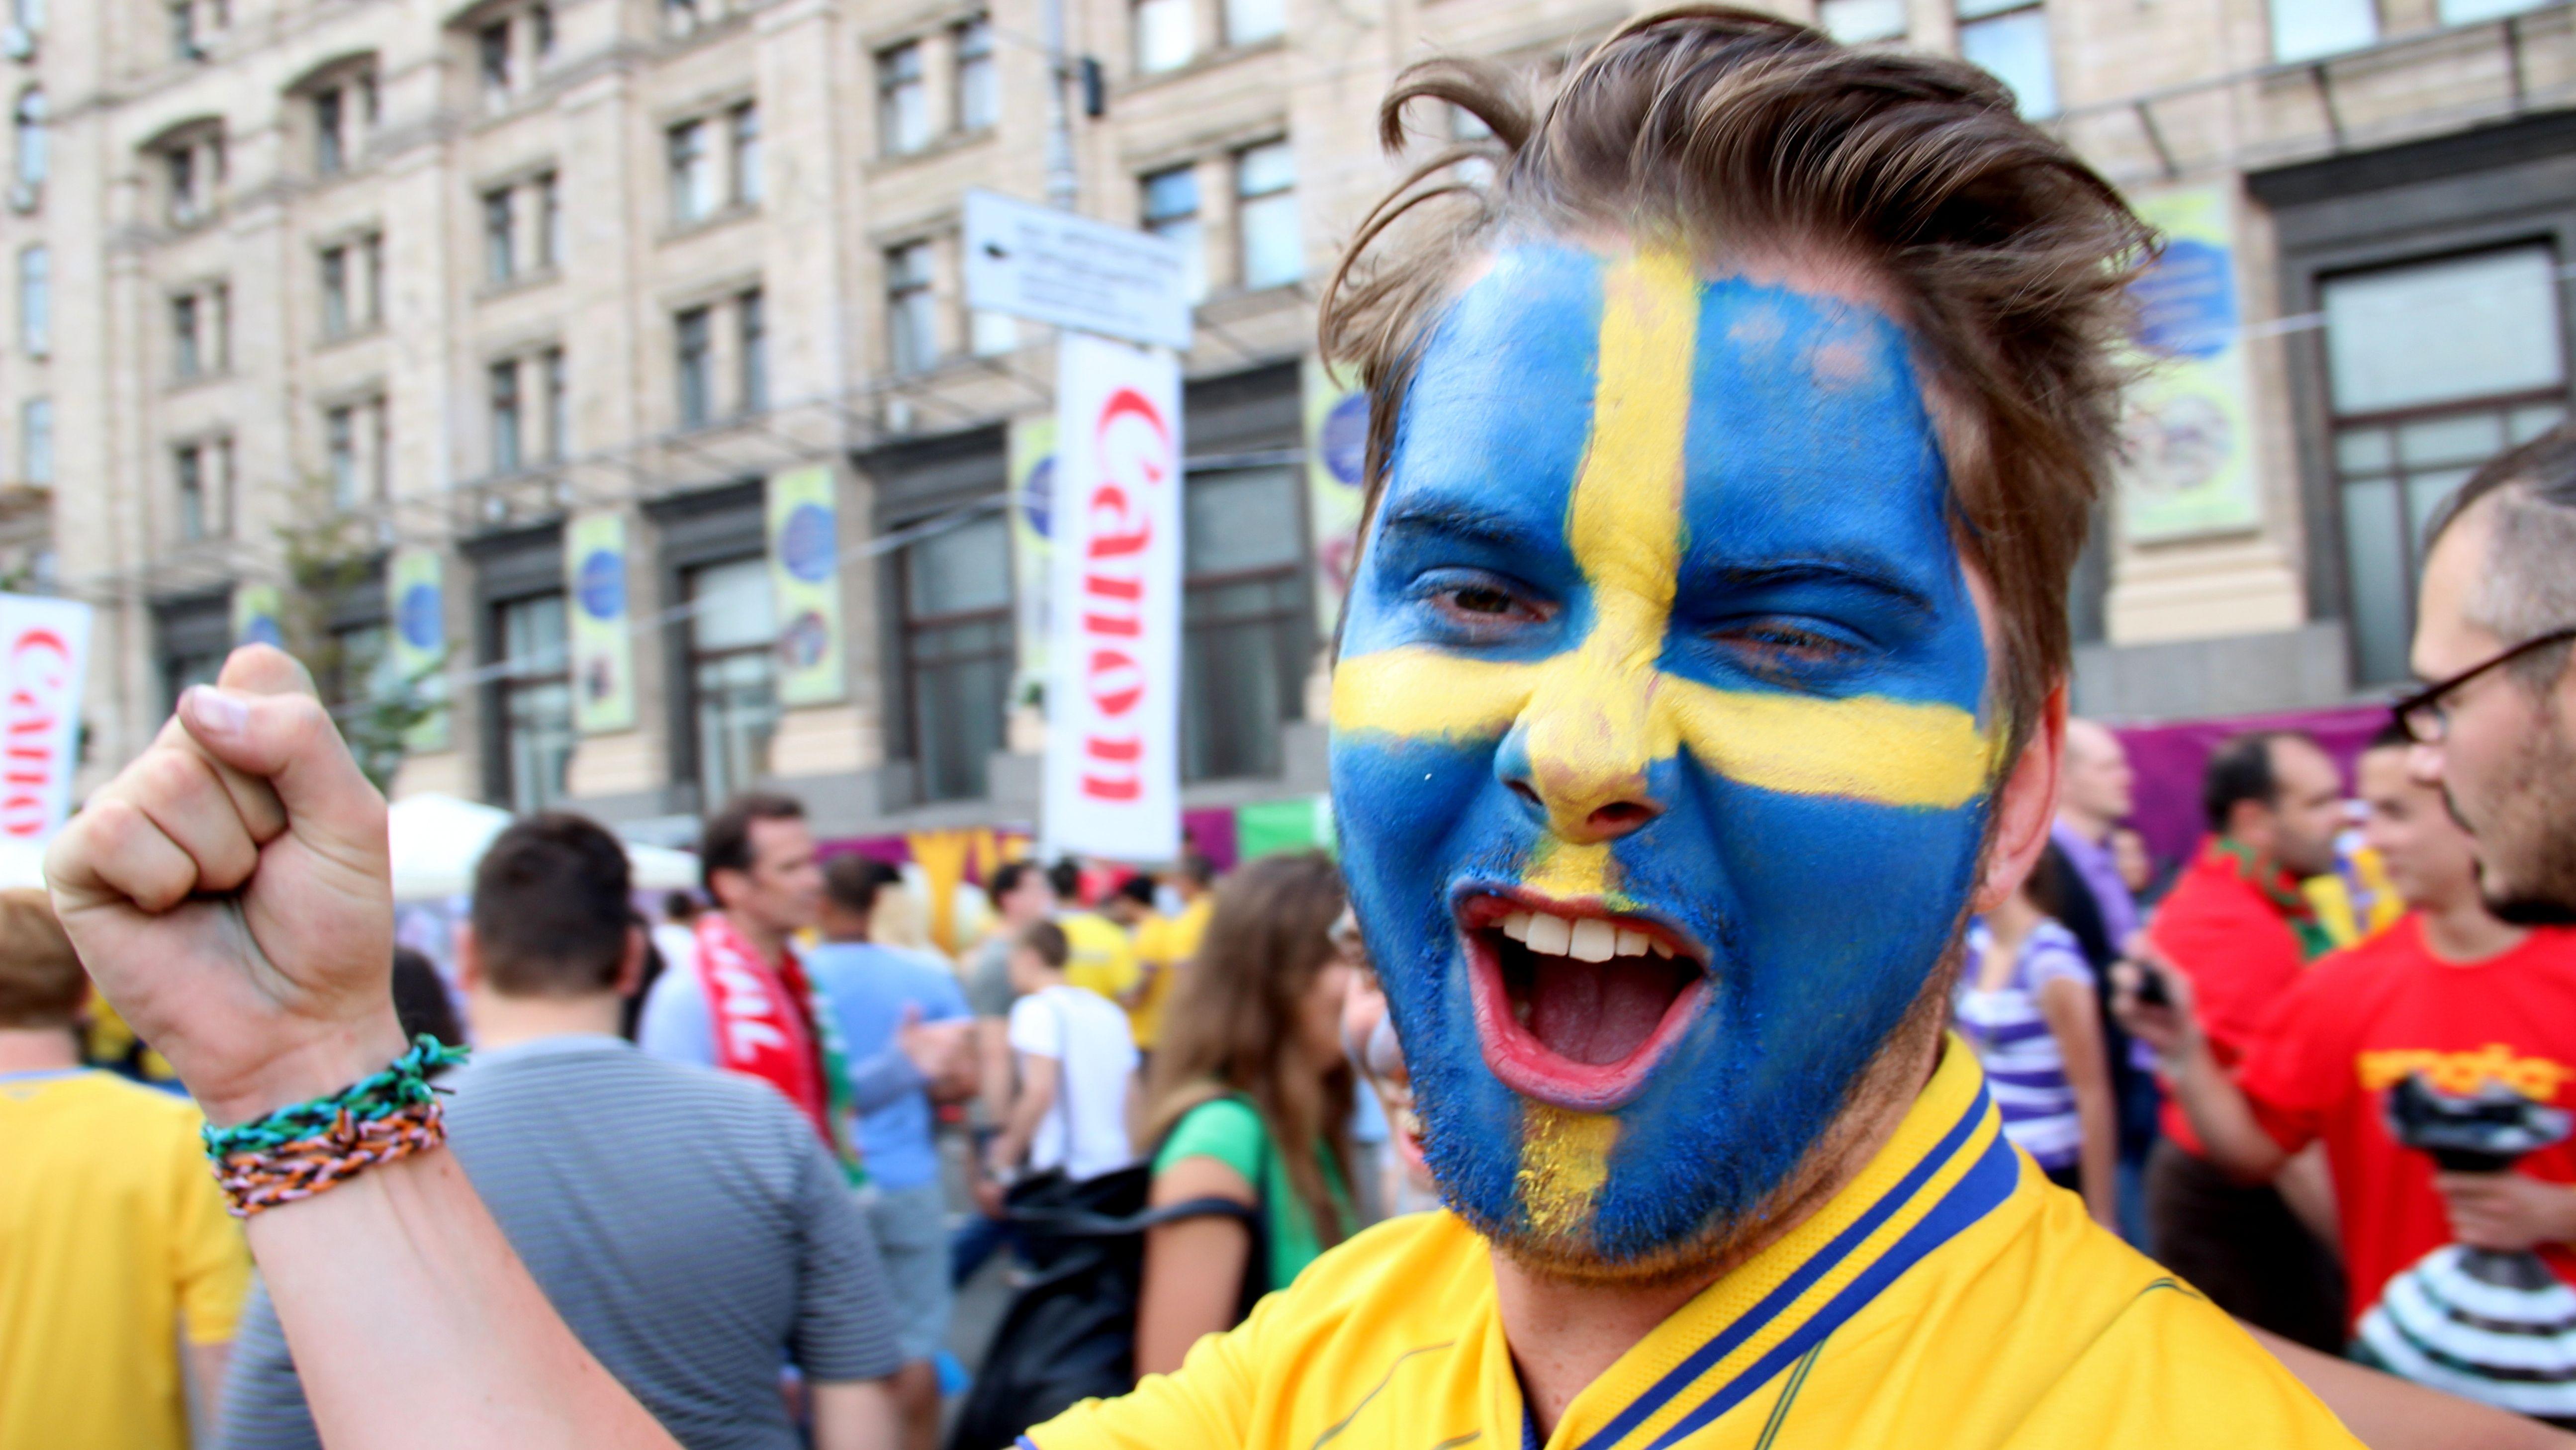 Ukraine - Swedish fans in the fan zone in Kyiv, June 15, 2012. Photo by Andriy Bashtovyy (RFE/RL)